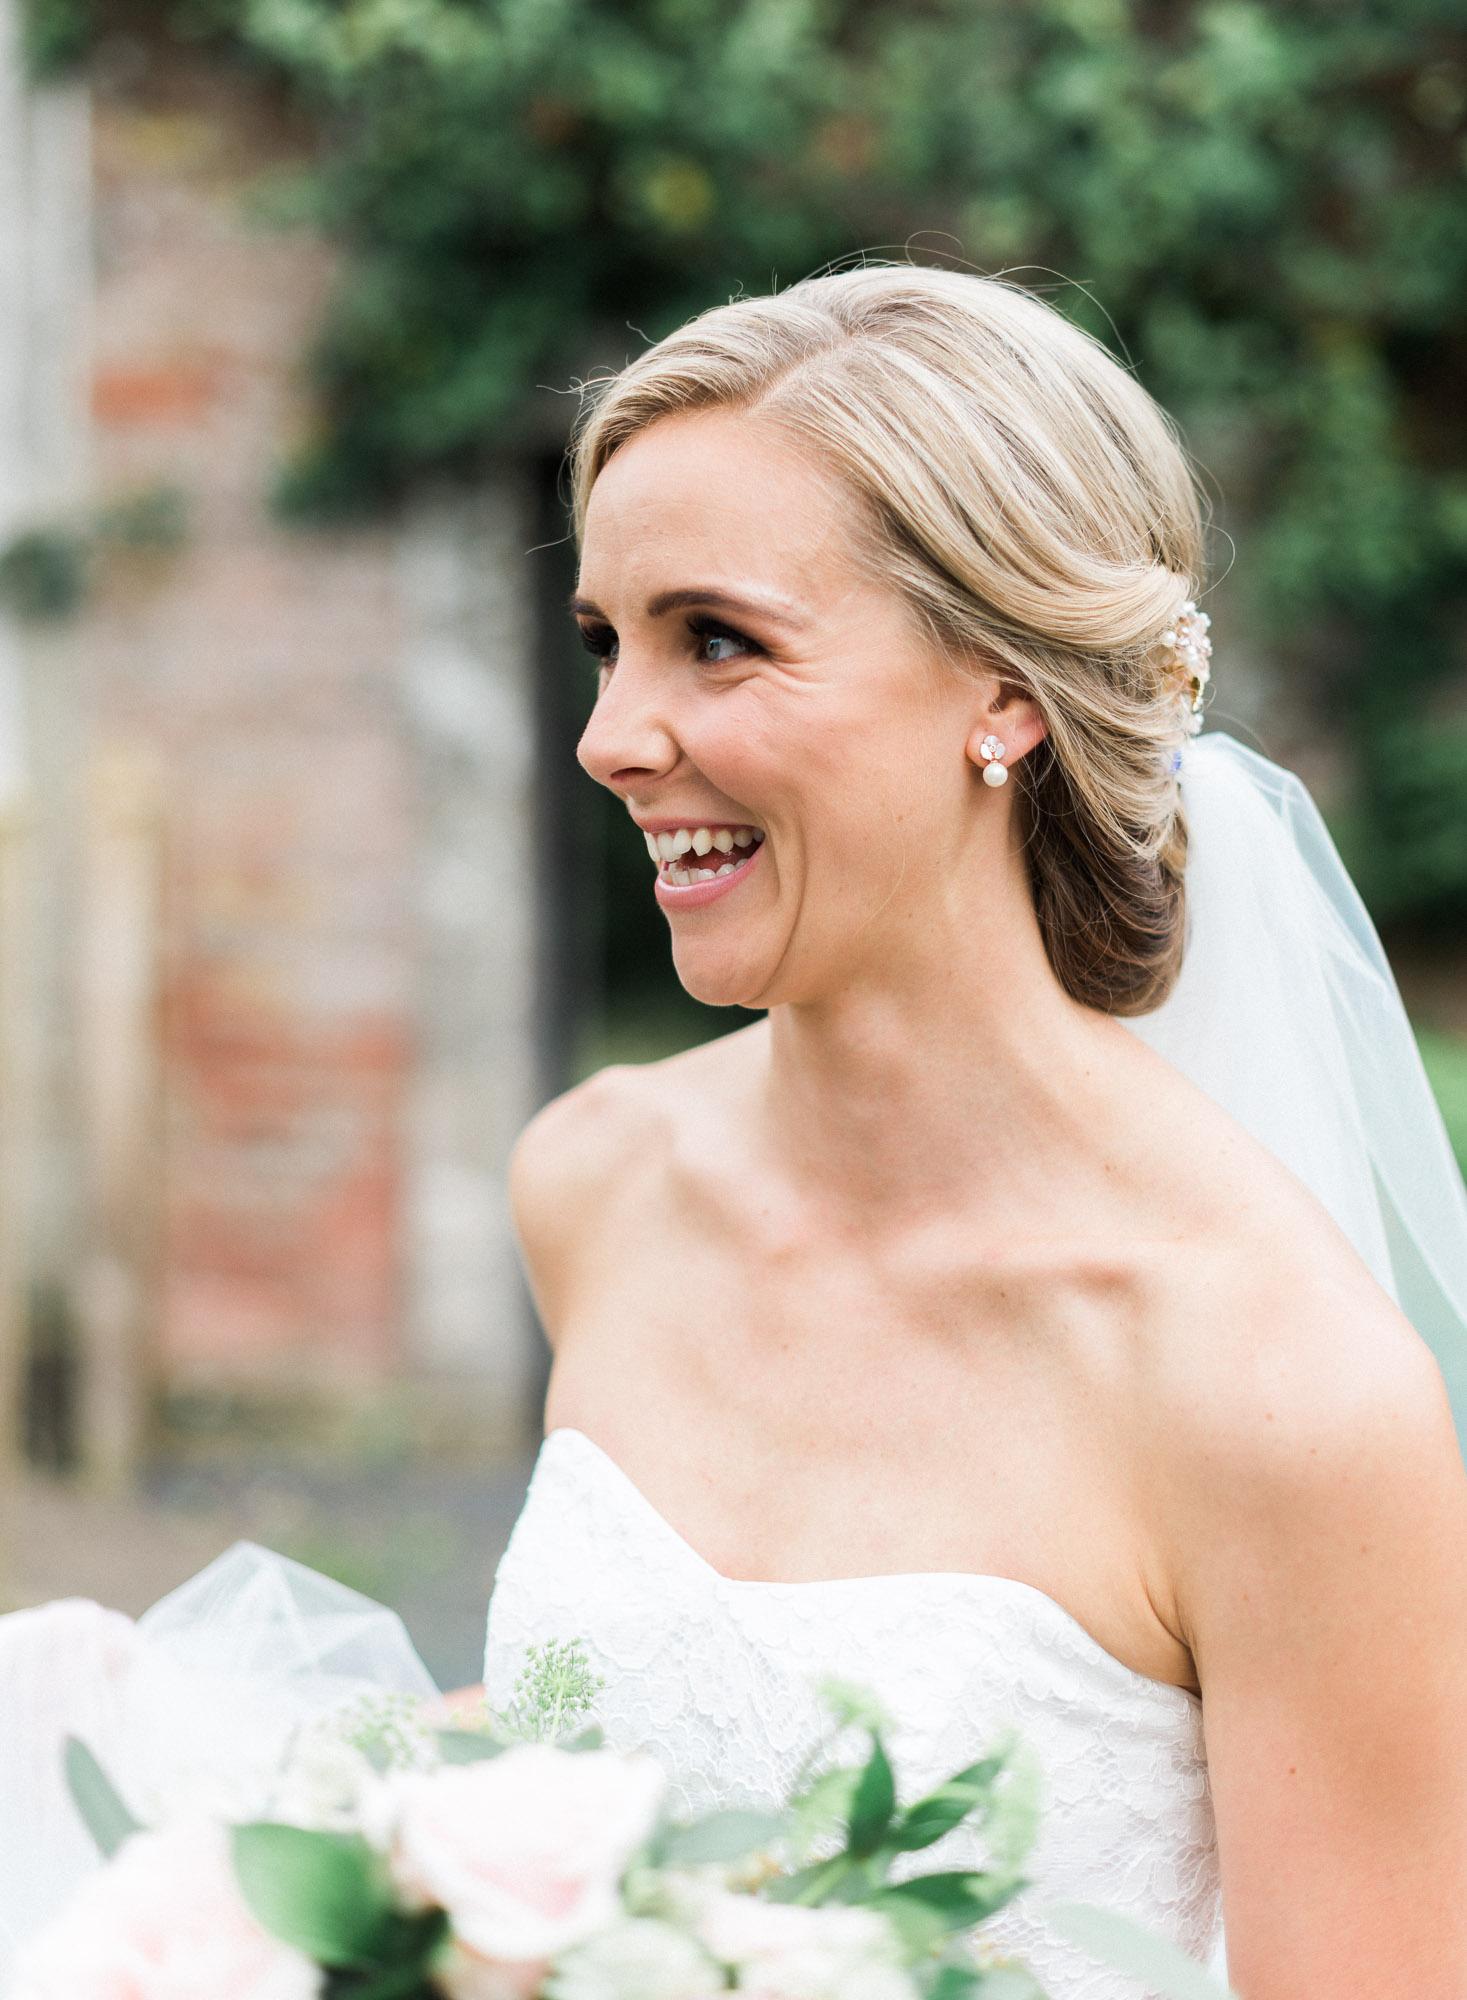 scottish_wedding_blairquhan_castle-39.jpg